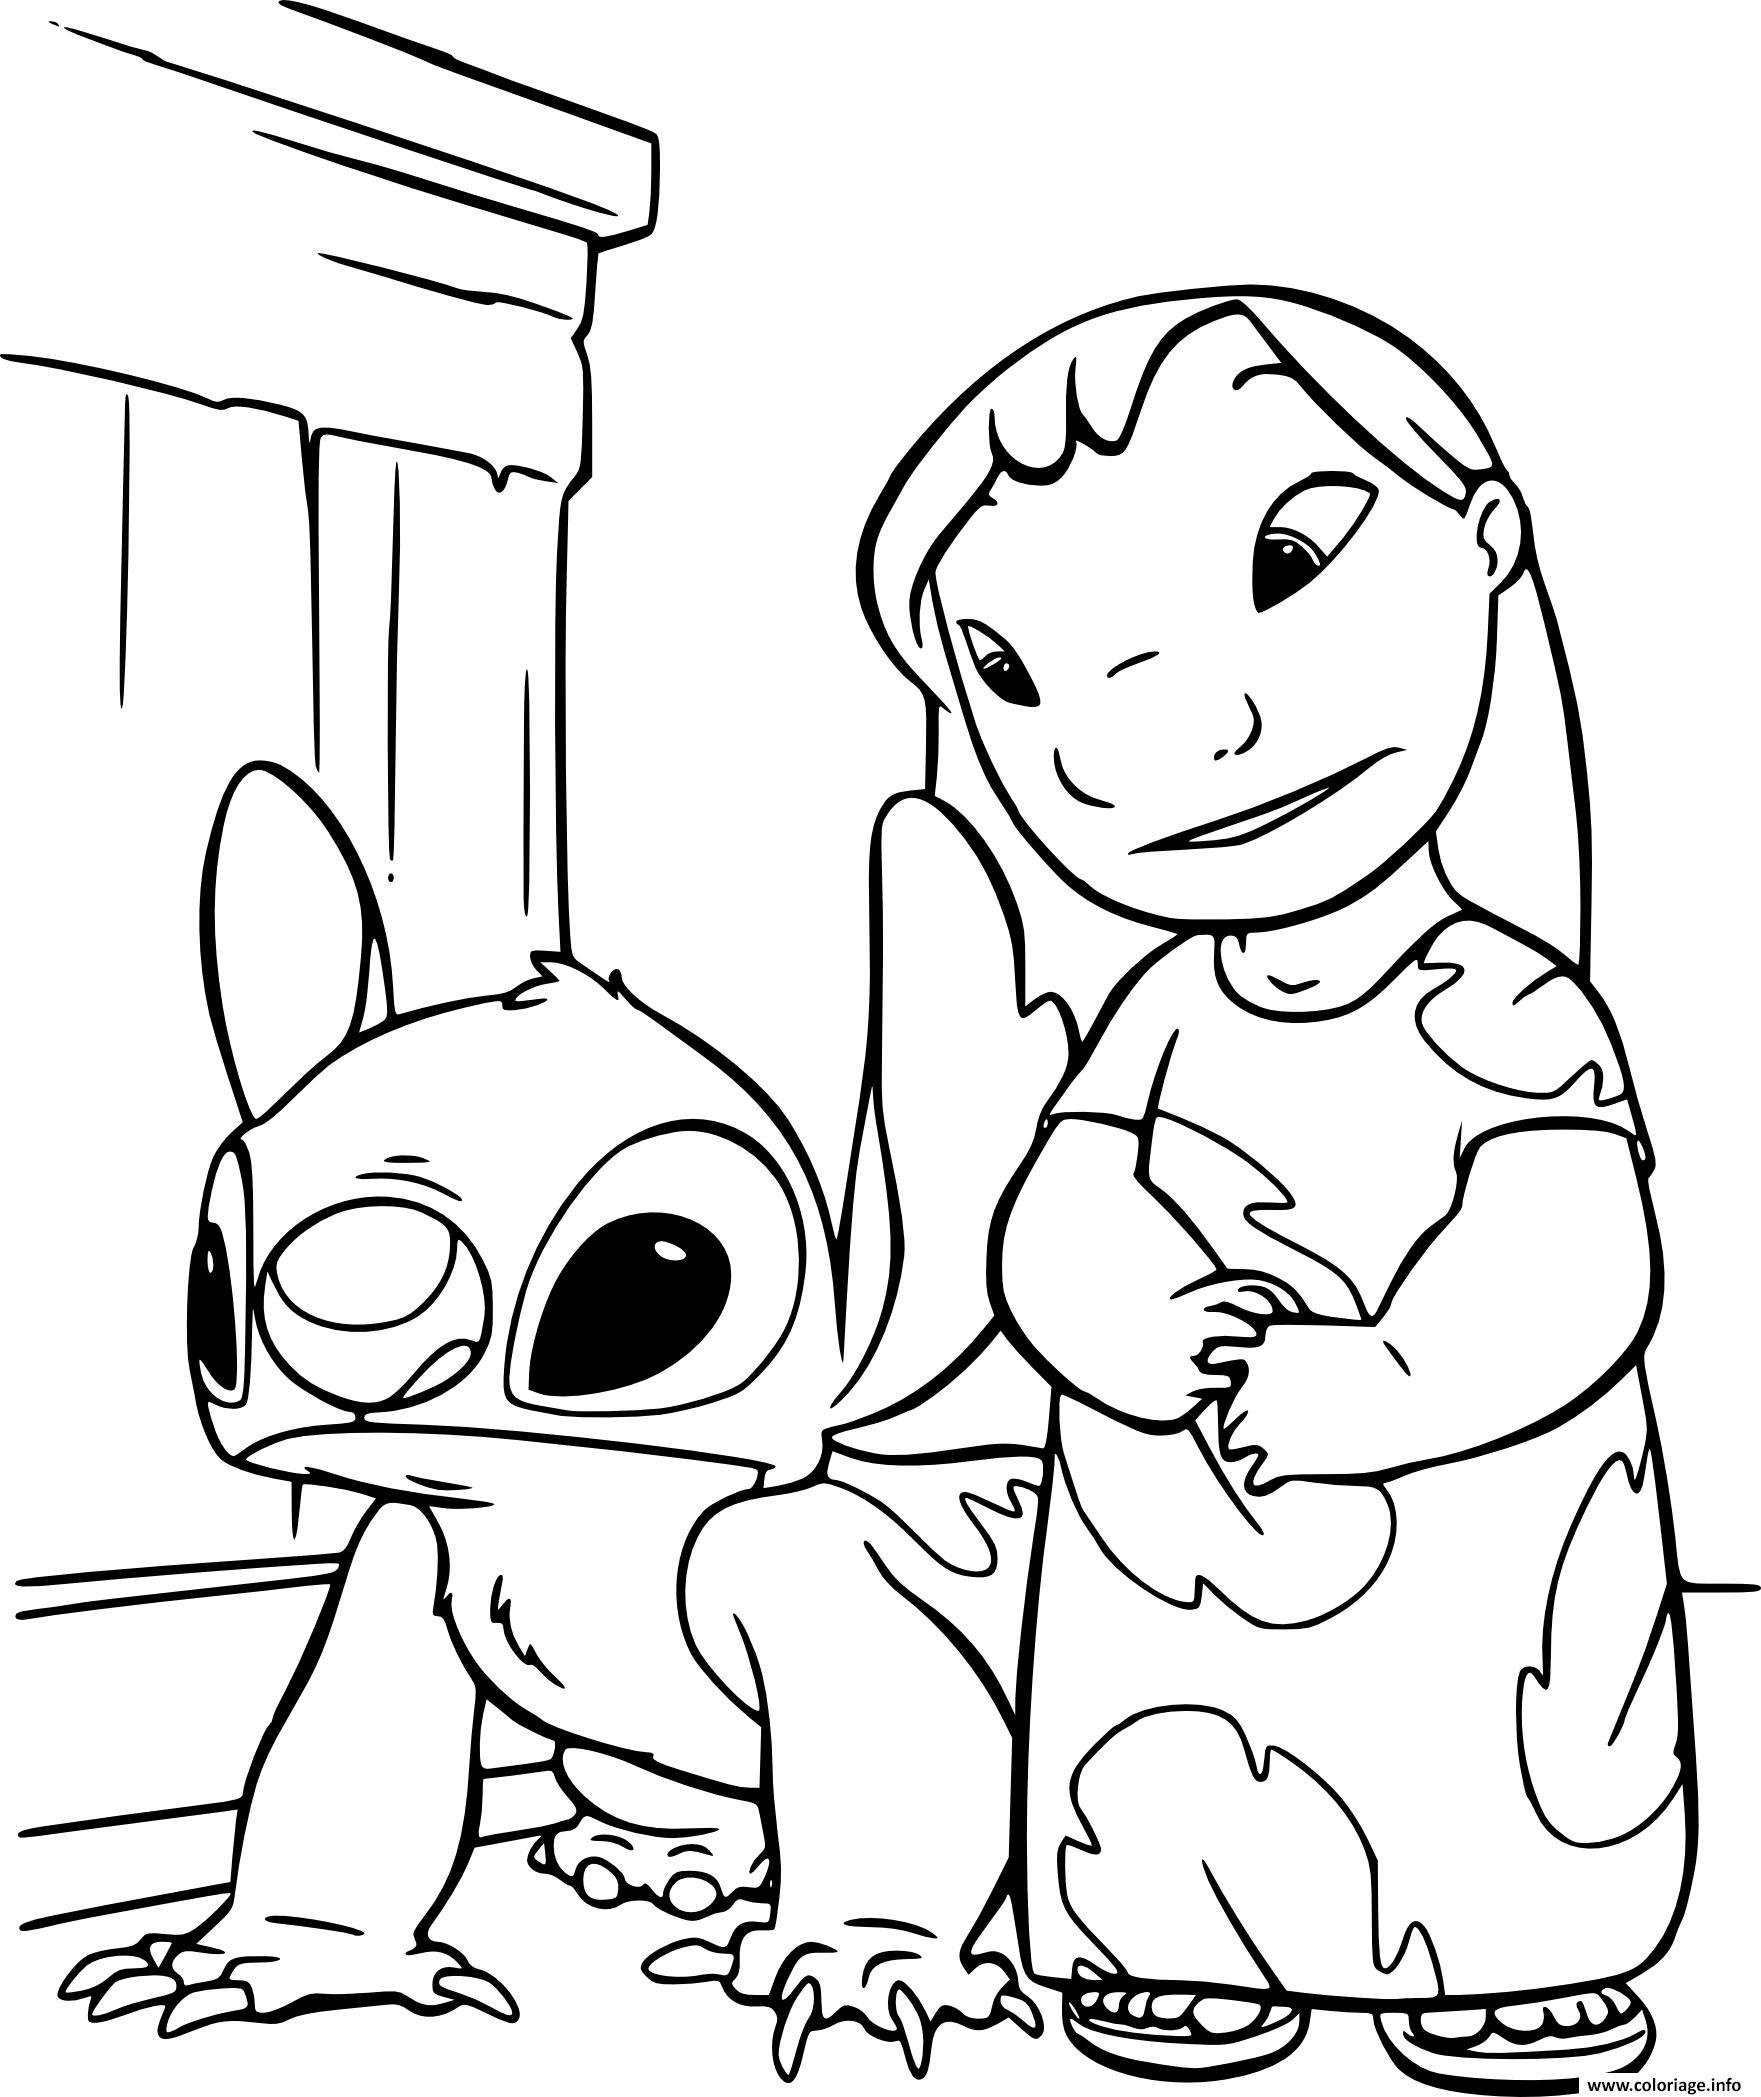 Coloriage Disney Lilo Et Stitch.Coloriage Lilo Et Stitch Jecolorie Com